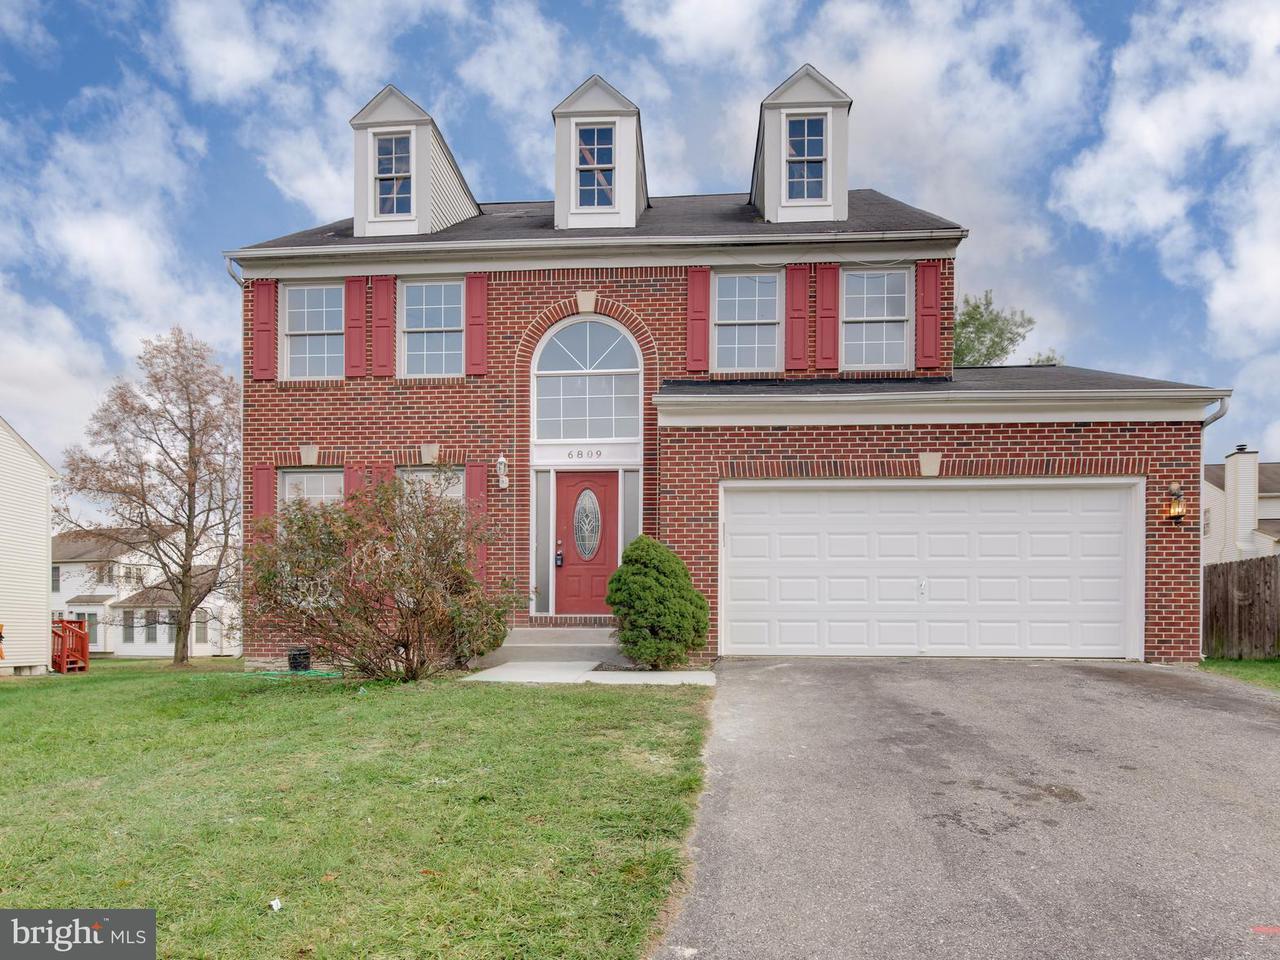 Single Family Home for Sale at 6809 LANDON Court 6809 LANDON Court Greenbelt, Maryland 20770 United States